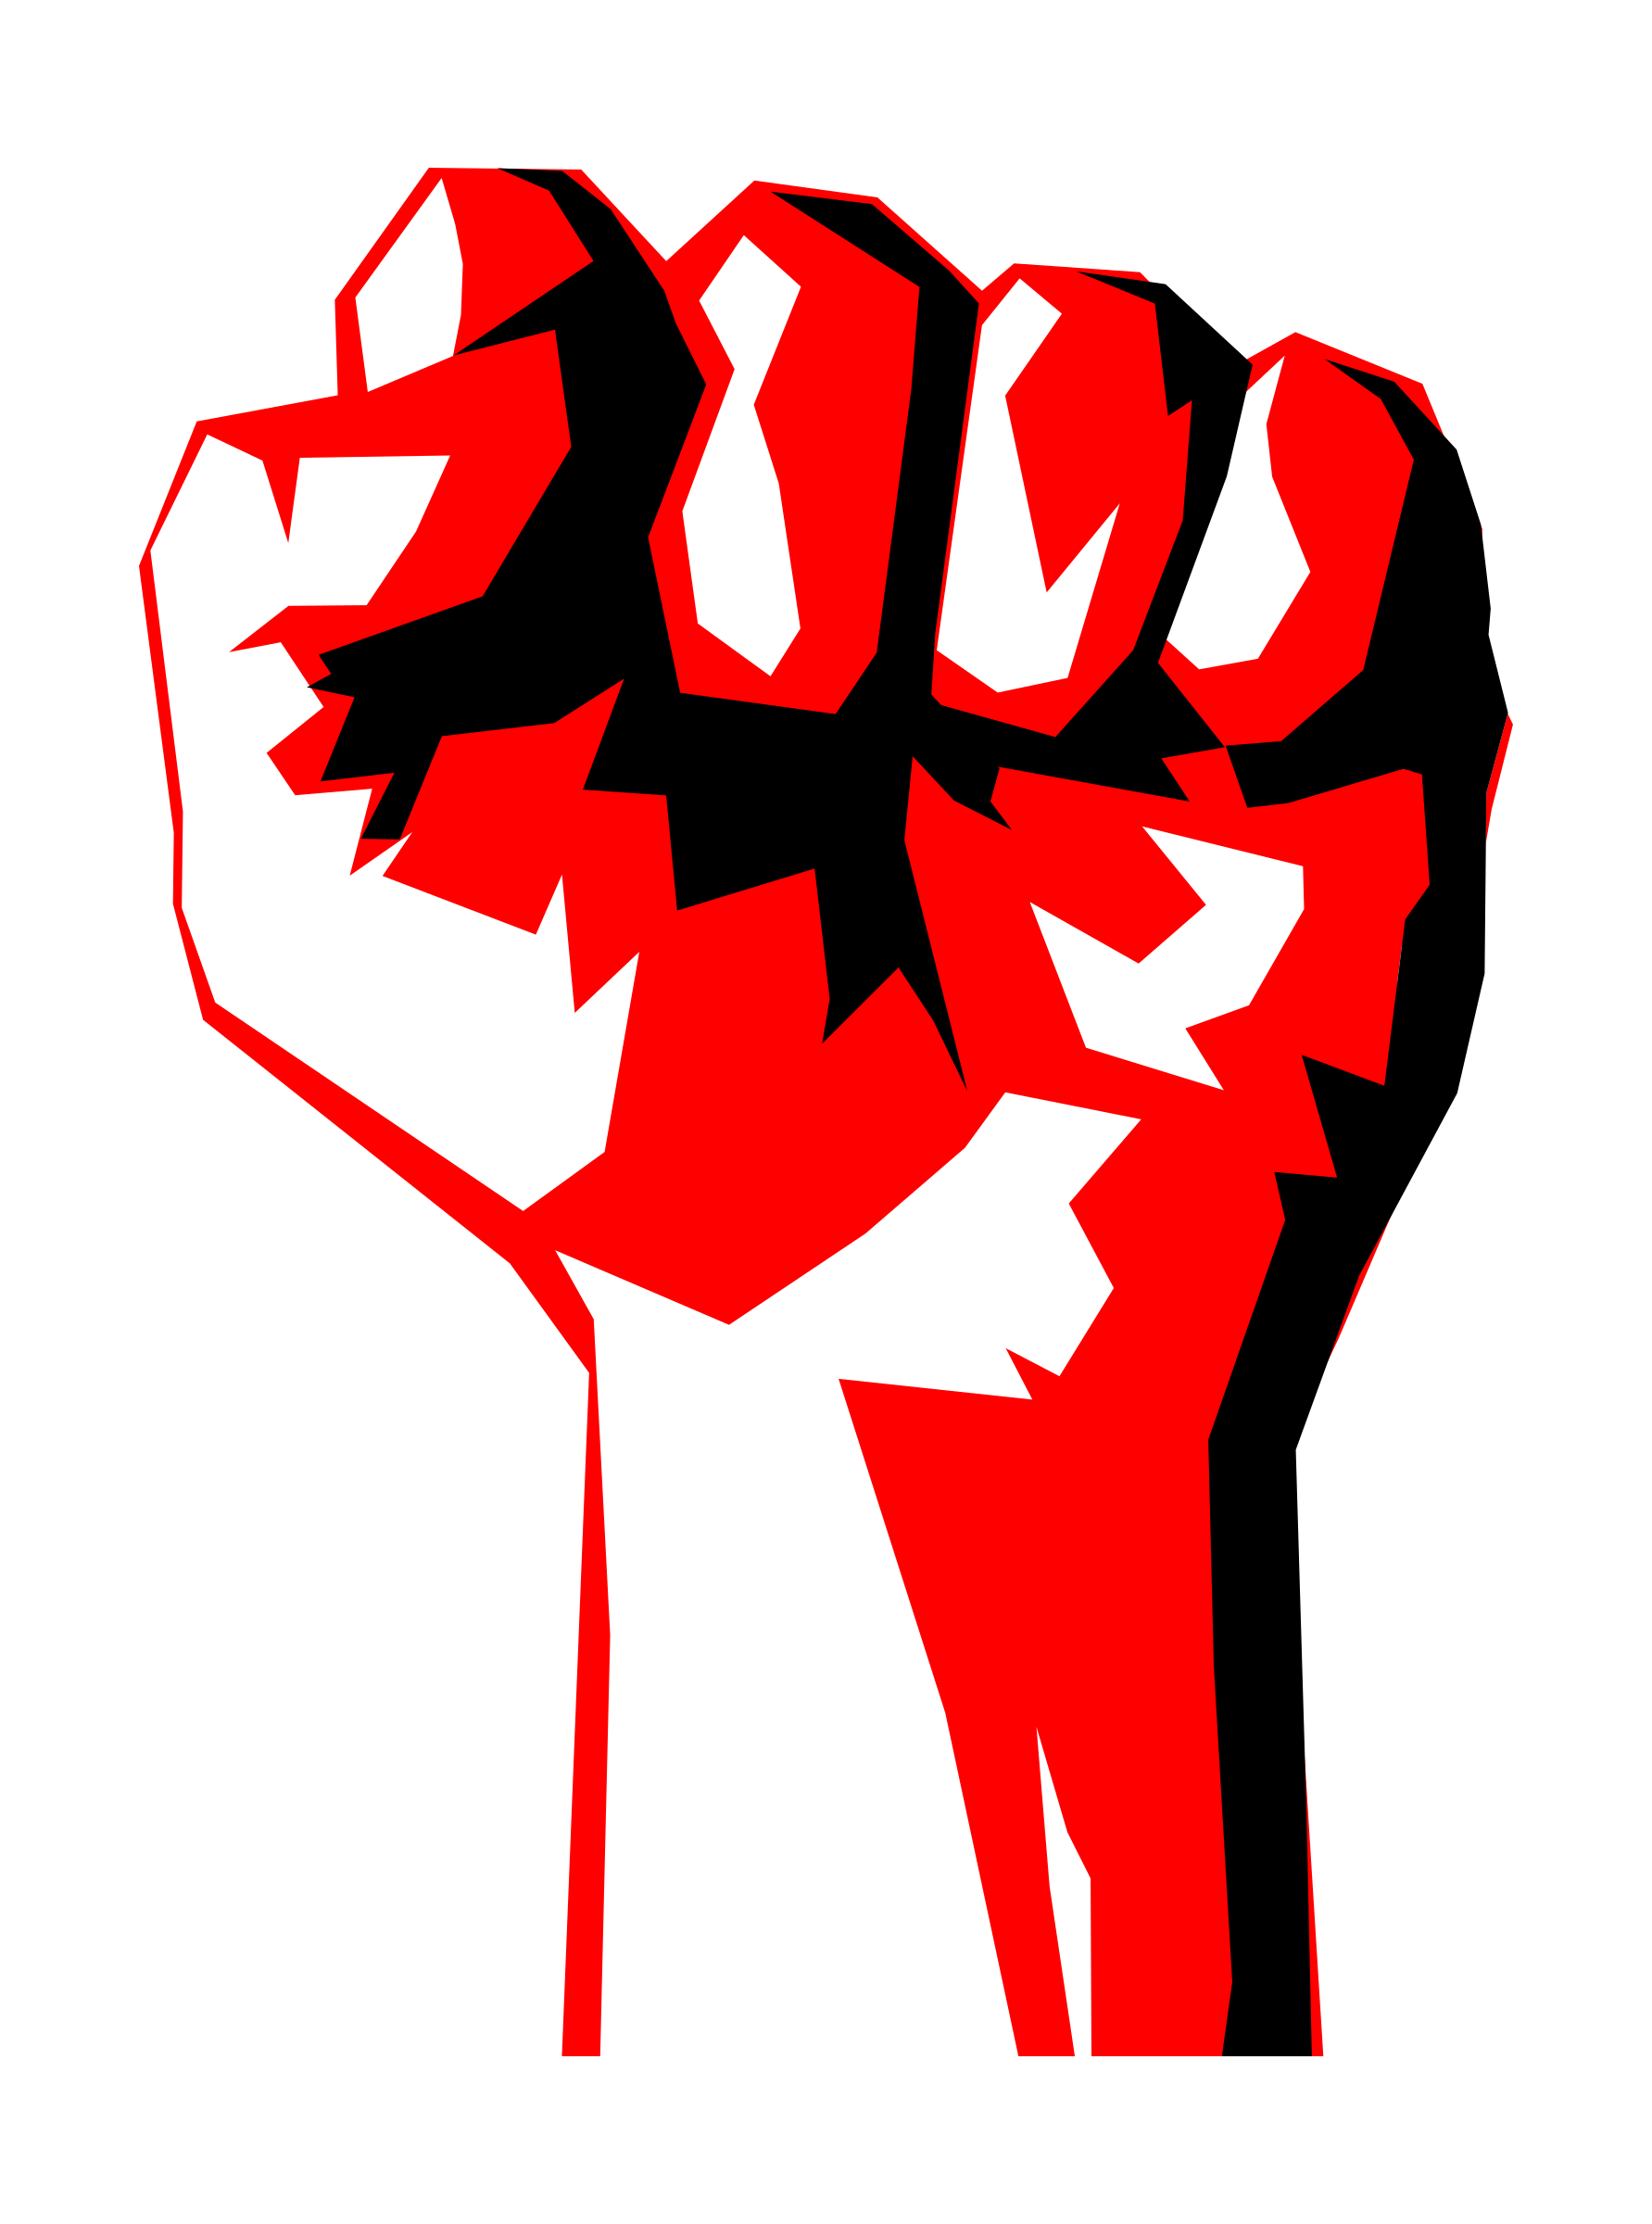 Worker fist big image. Fight clipart socialist